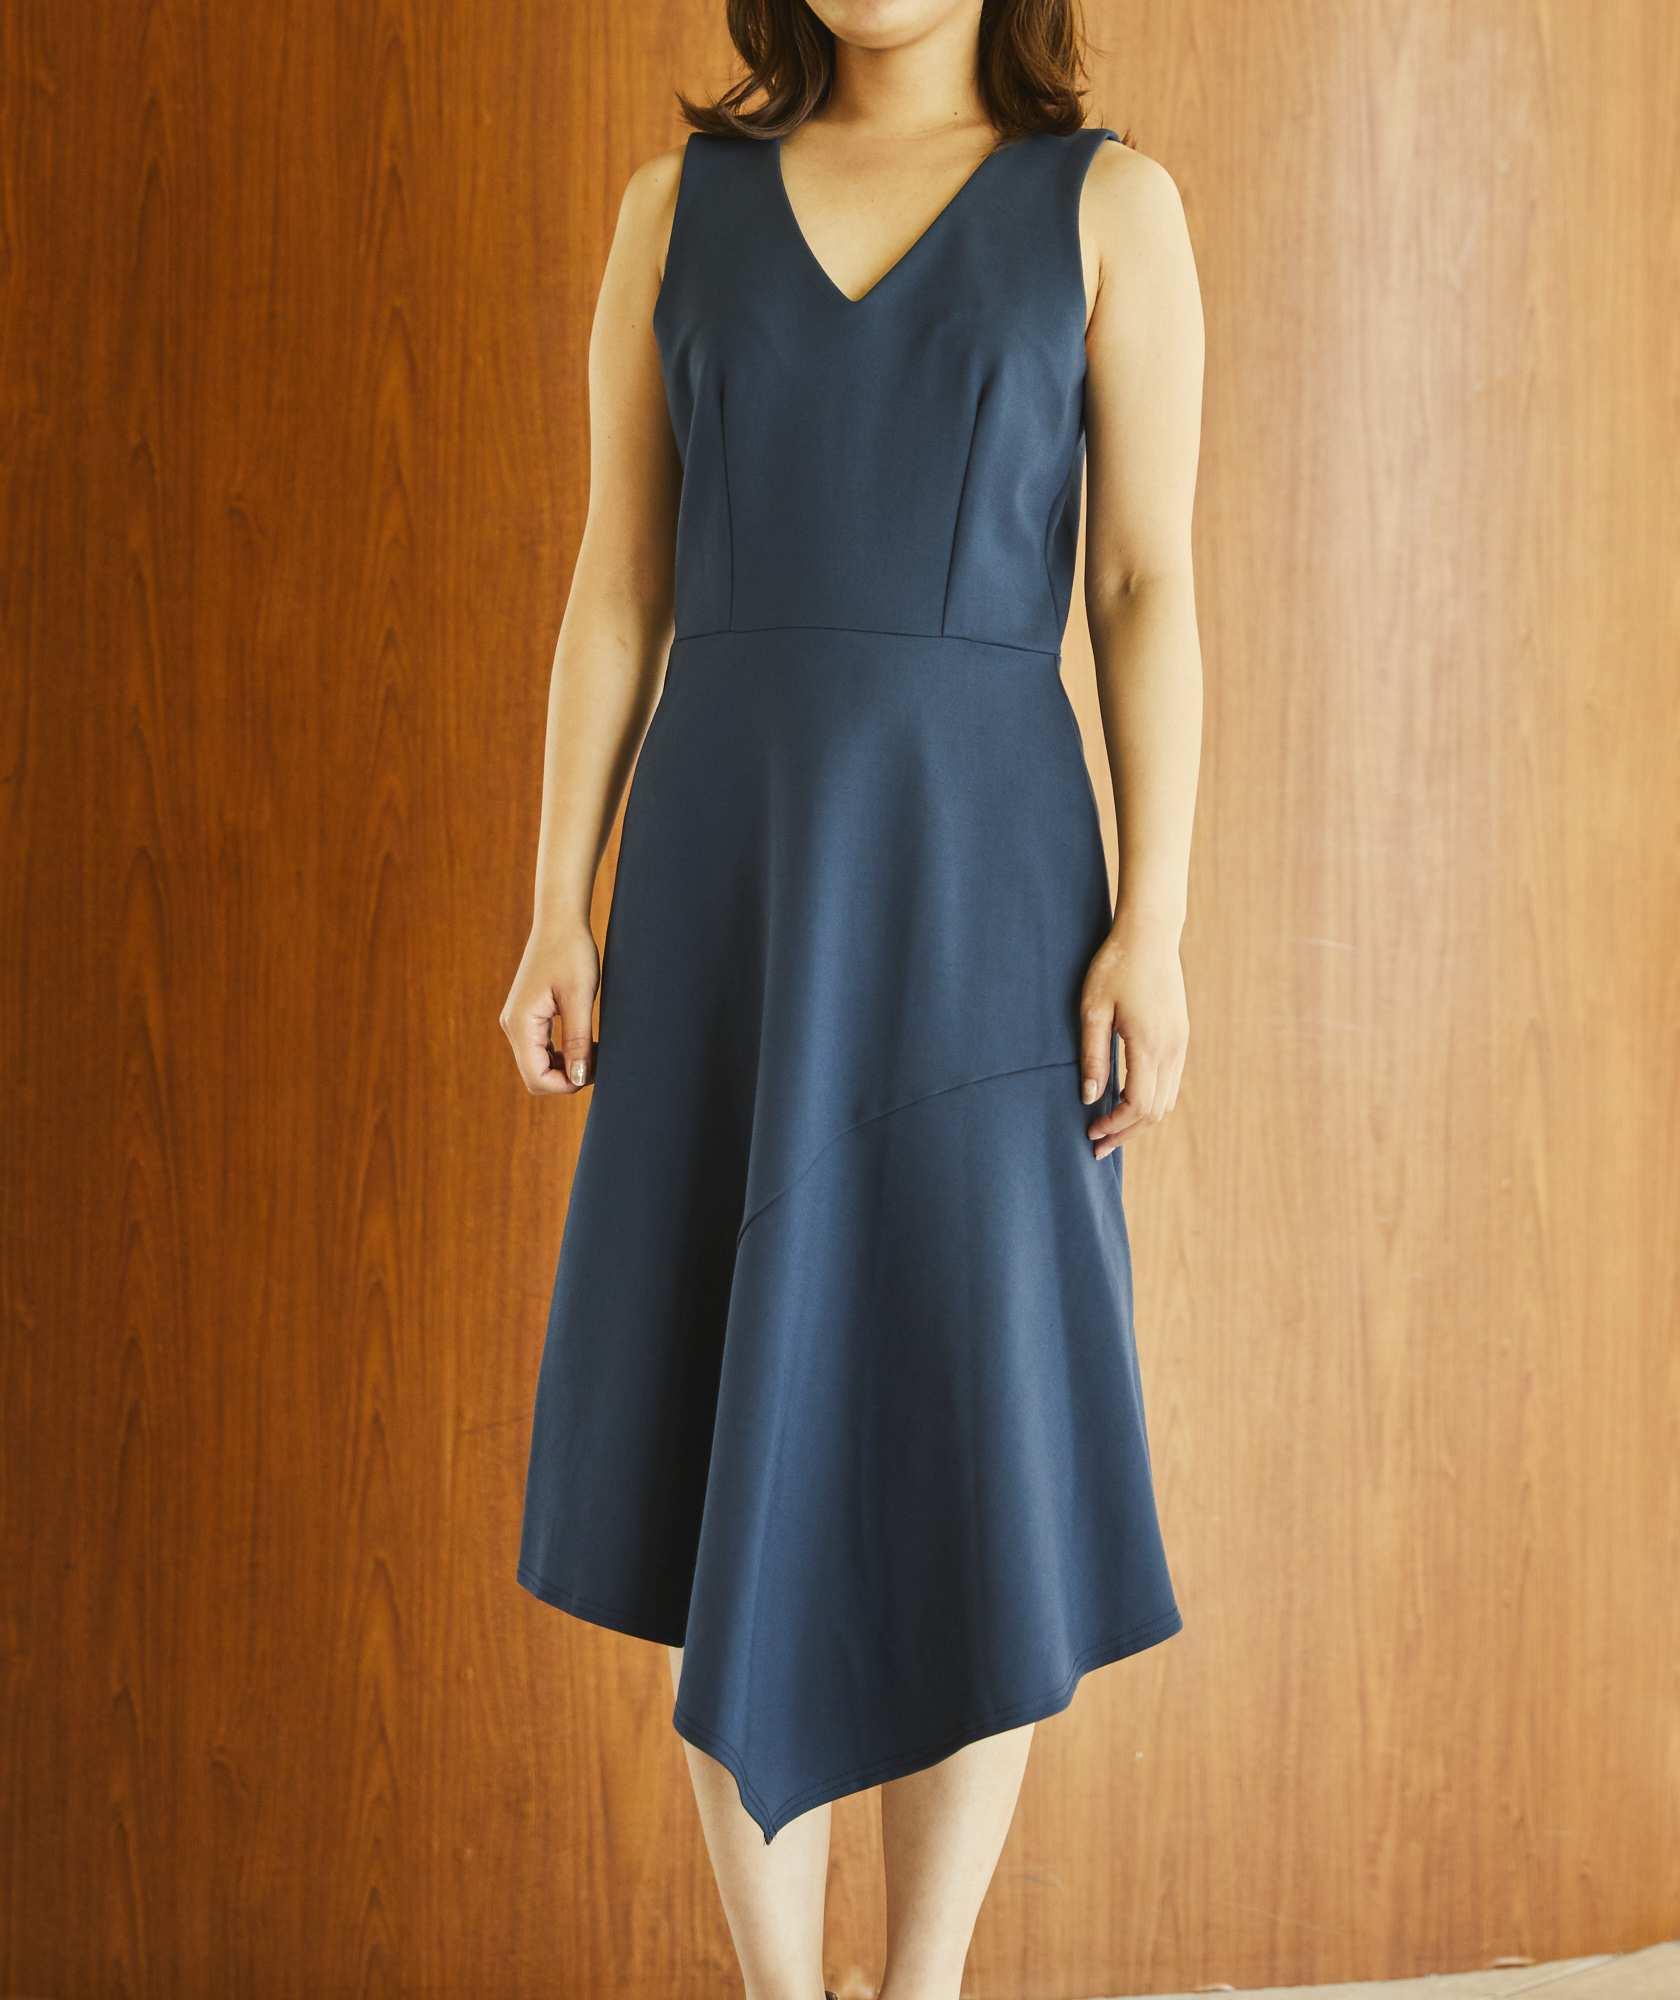 Vネックアシンメトリージャージーミディアムドレス-ネイビー-S